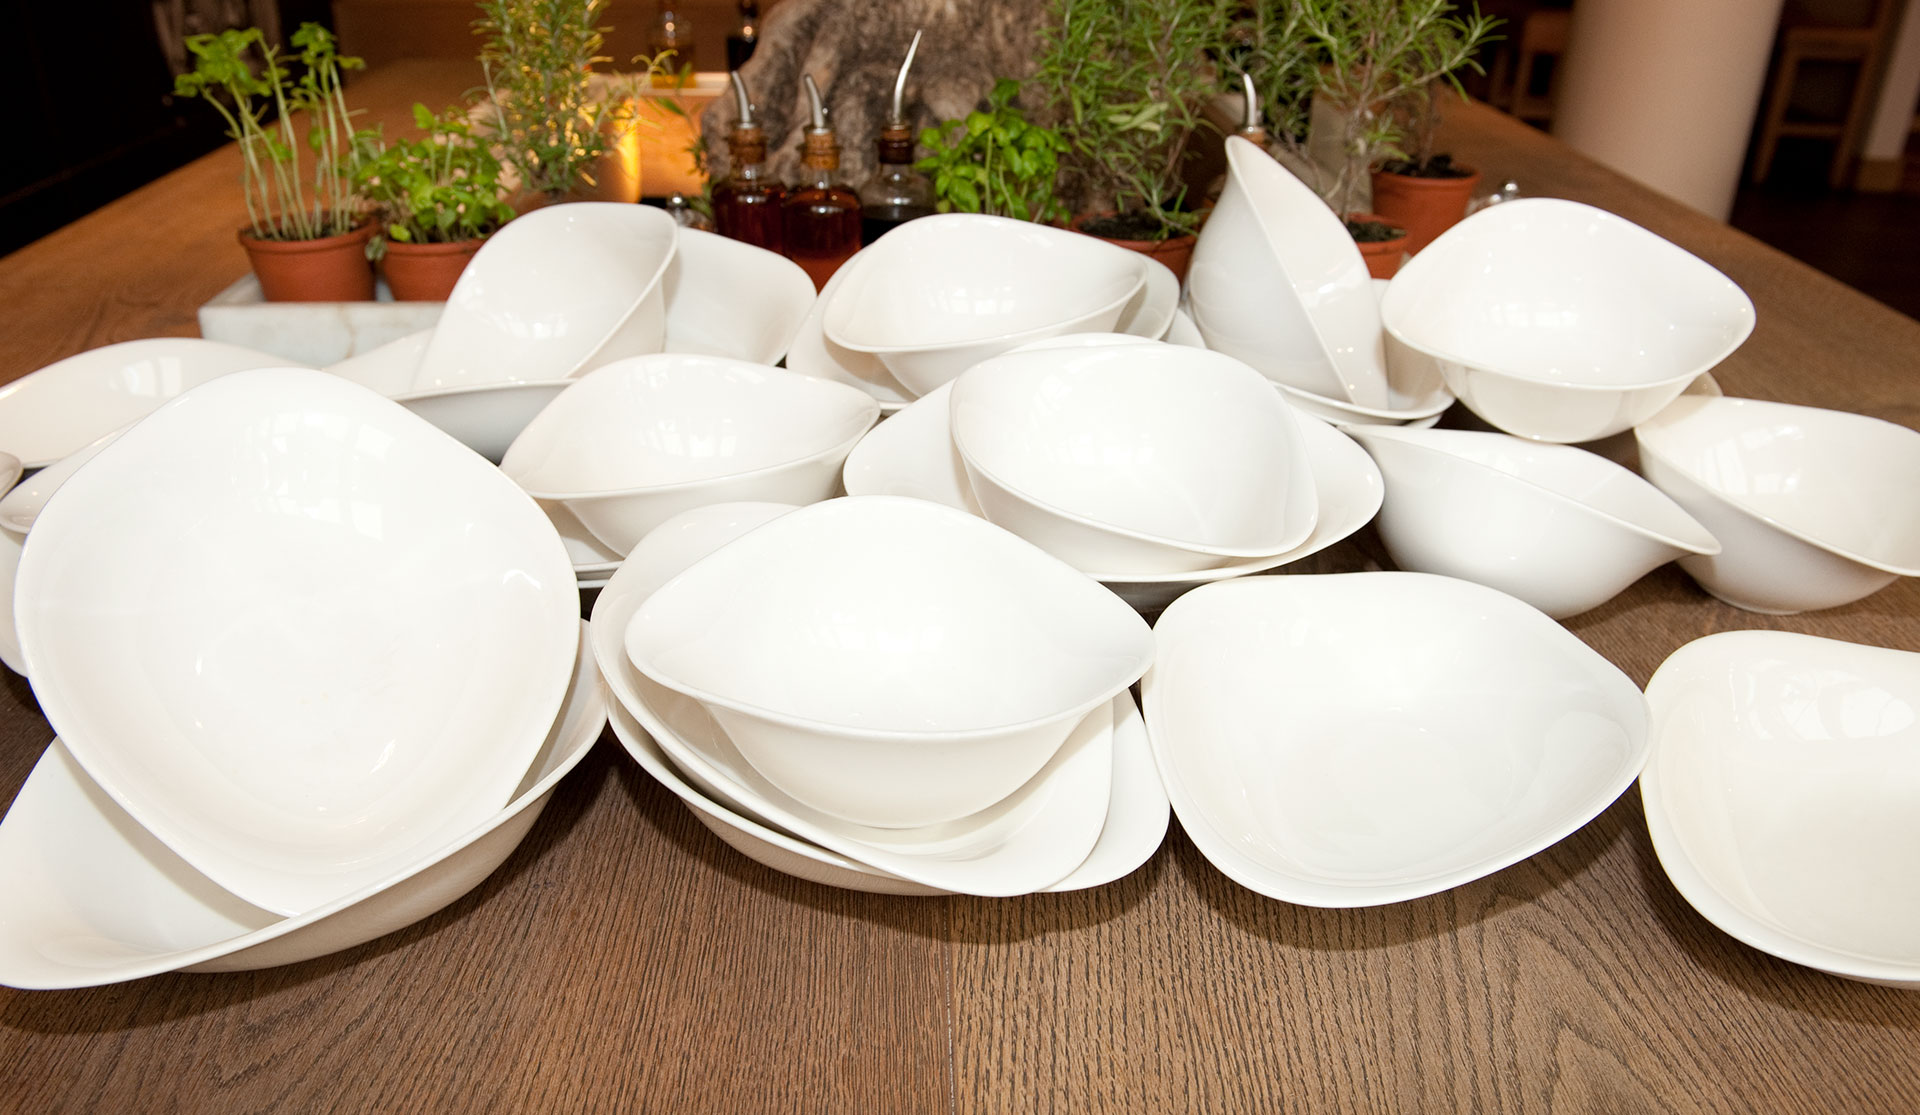 tableware collection dune for villeroy boch matteo thun partners. Black Bedroom Furniture Sets. Home Design Ideas